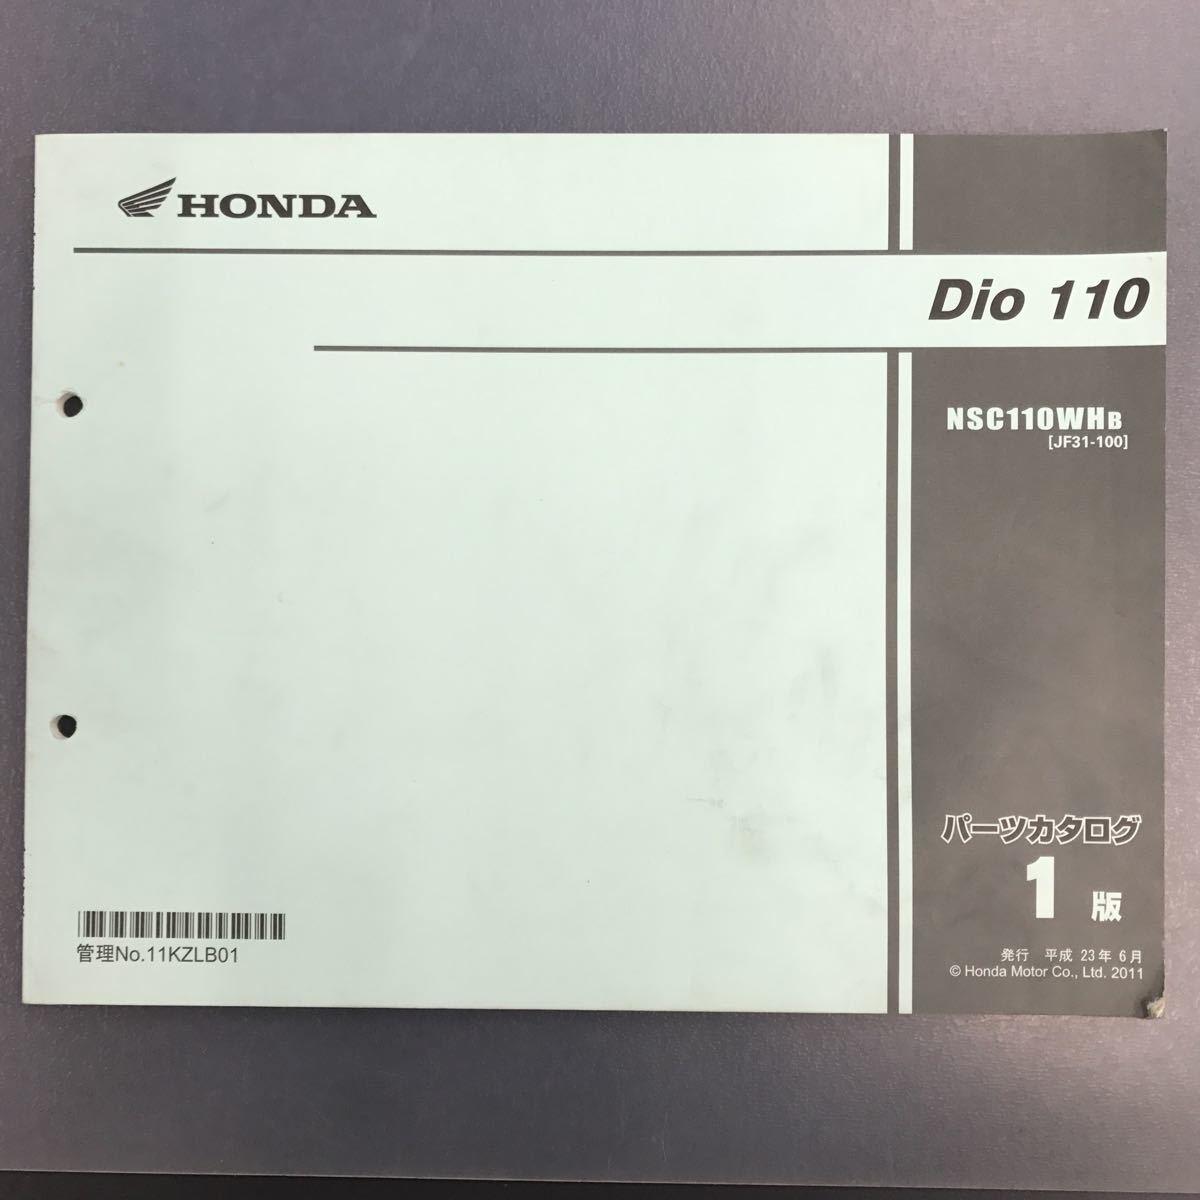 Dio110 JF31 パーツリスト パーツカタログ 1版